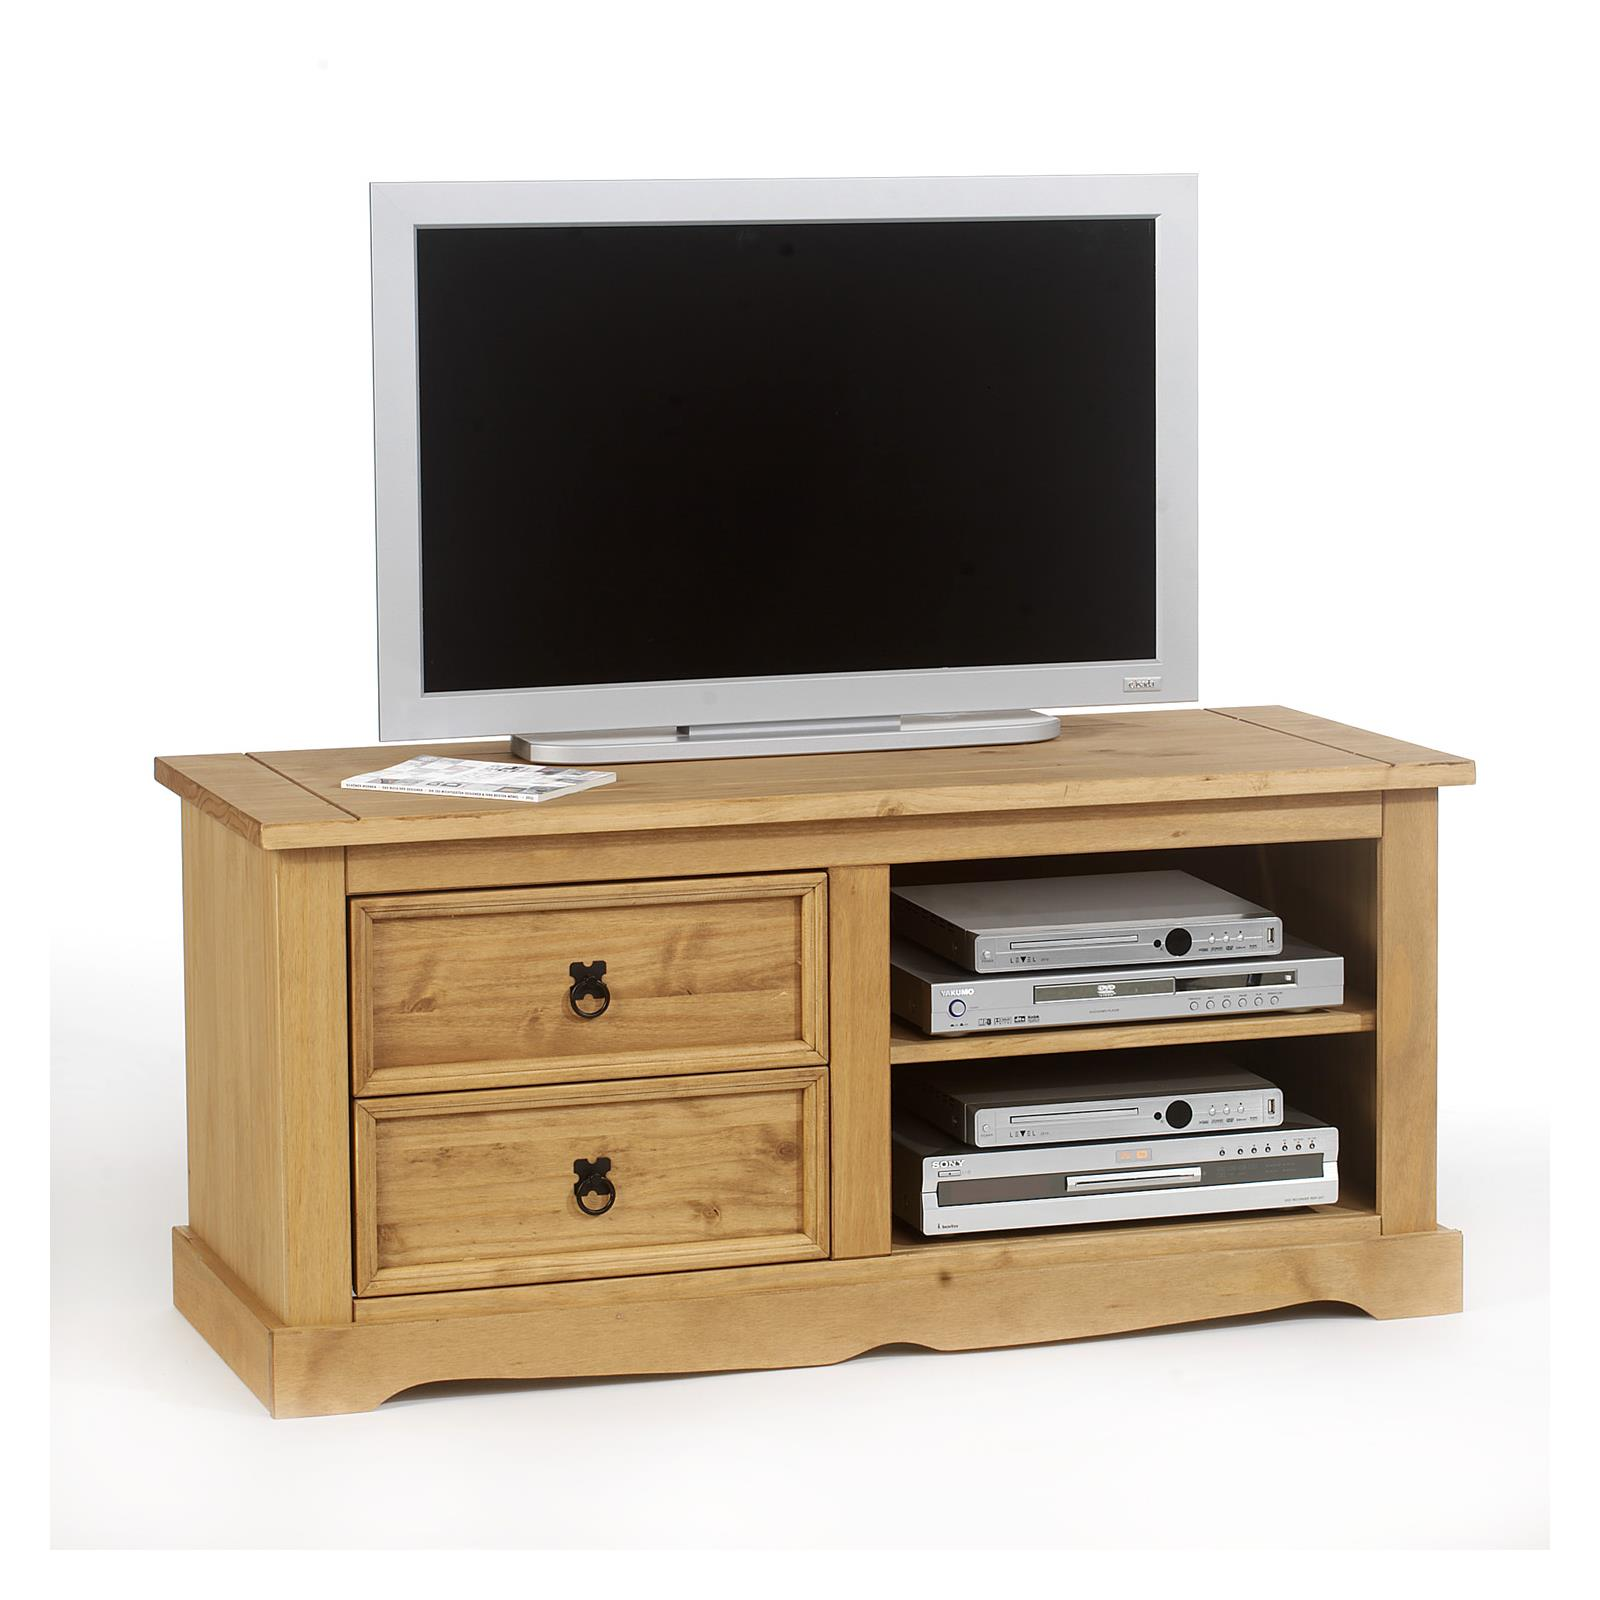 meuble tv en pin tequila style mexicain finition cir e mobil meubles. Black Bedroom Furniture Sets. Home Design Ideas